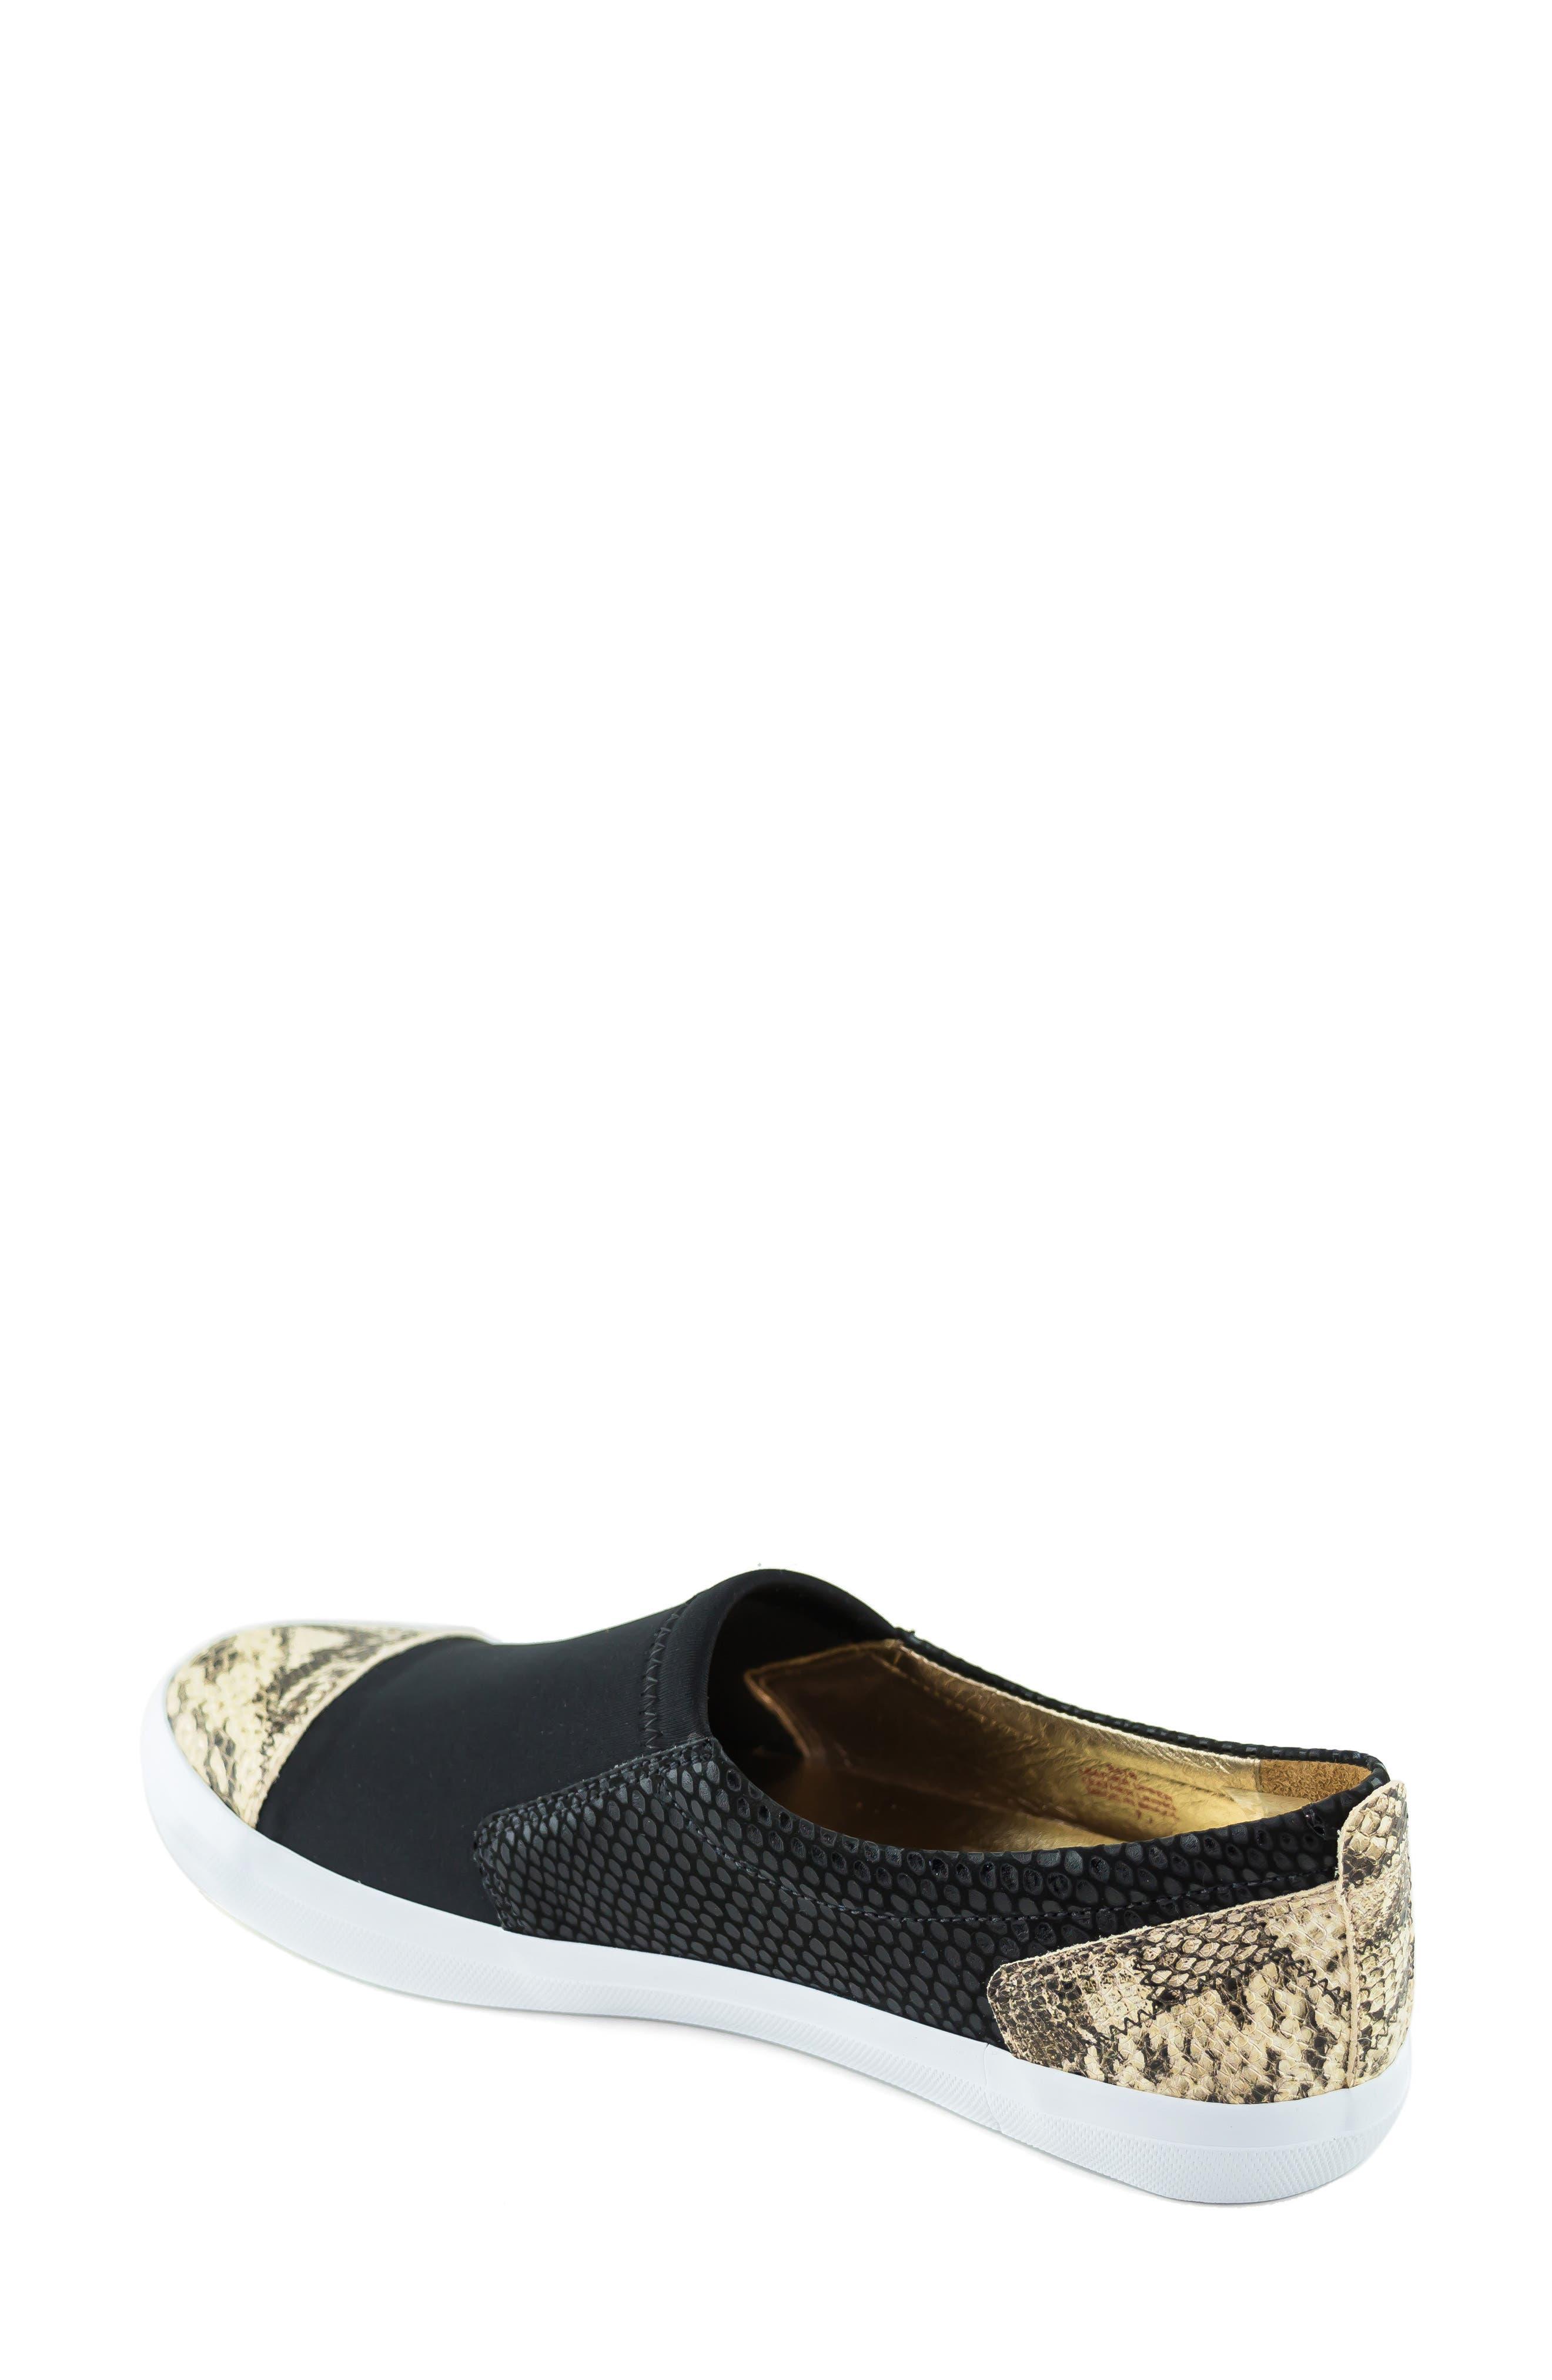 MARC JOSEPH NEW YORK, Jay Street Sneaker, Alternate thumbnail 2, color, BLACK PATCHWORK